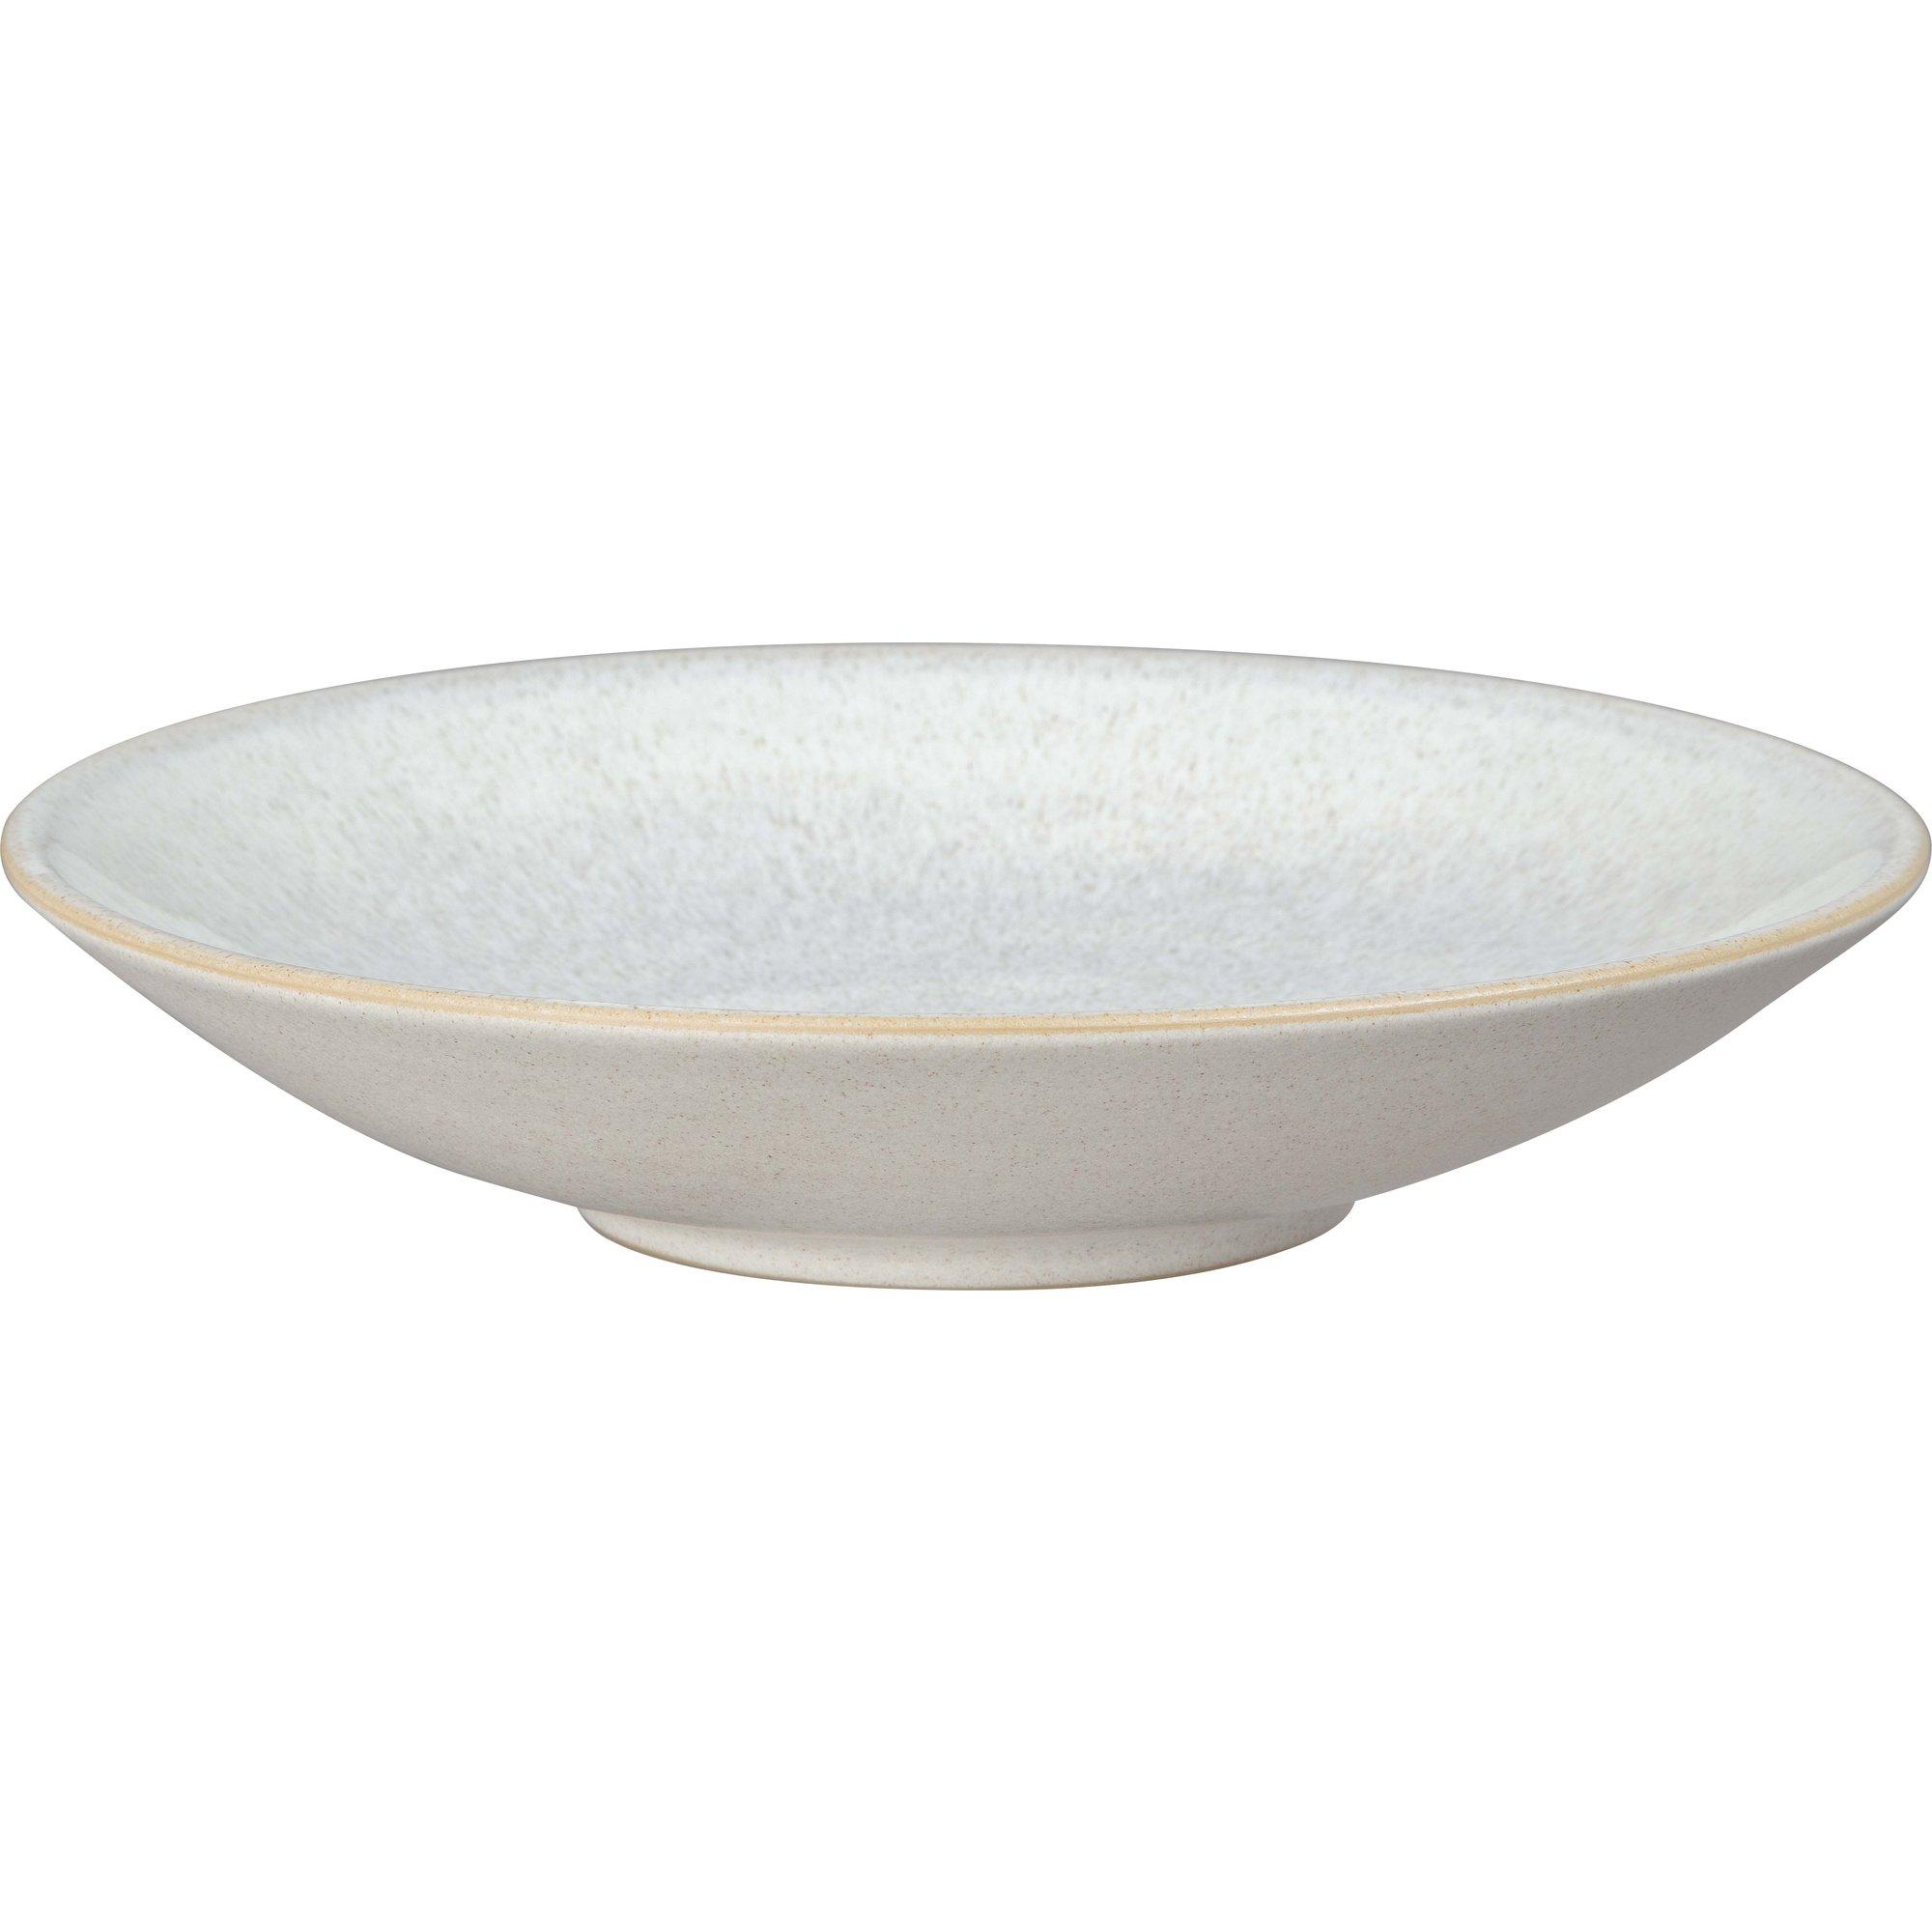 Denby Modus Speckle Pastaskål 23 cm